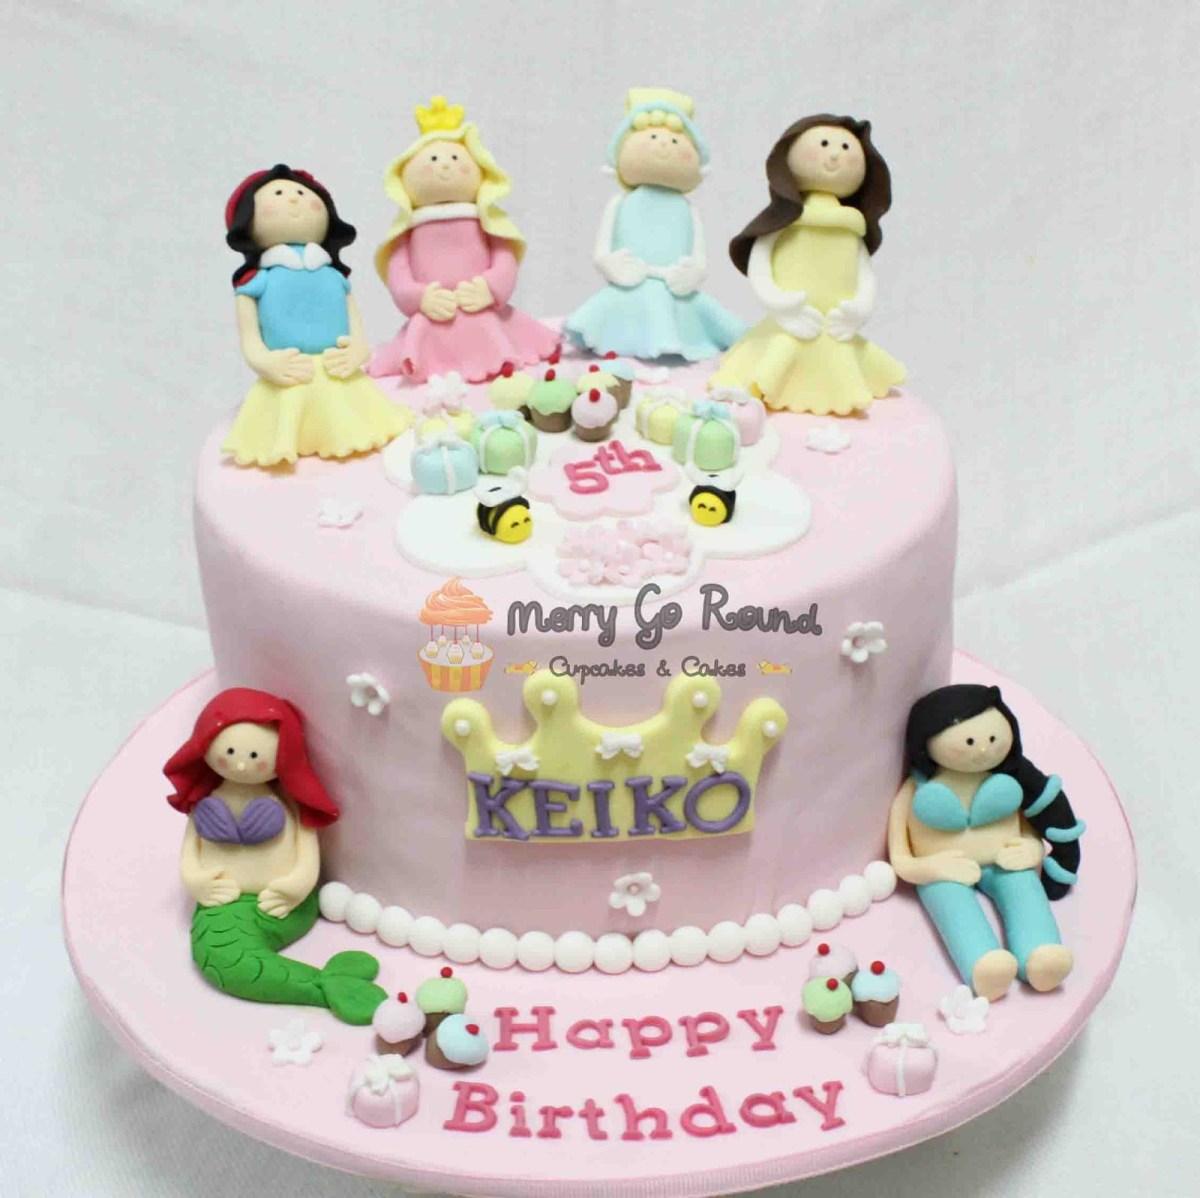 Peachy Disney Princess Birthday Cakes Merry Go Round Cupcakes Cakes Funny Birthday Cards Online Inifodamsfinfo